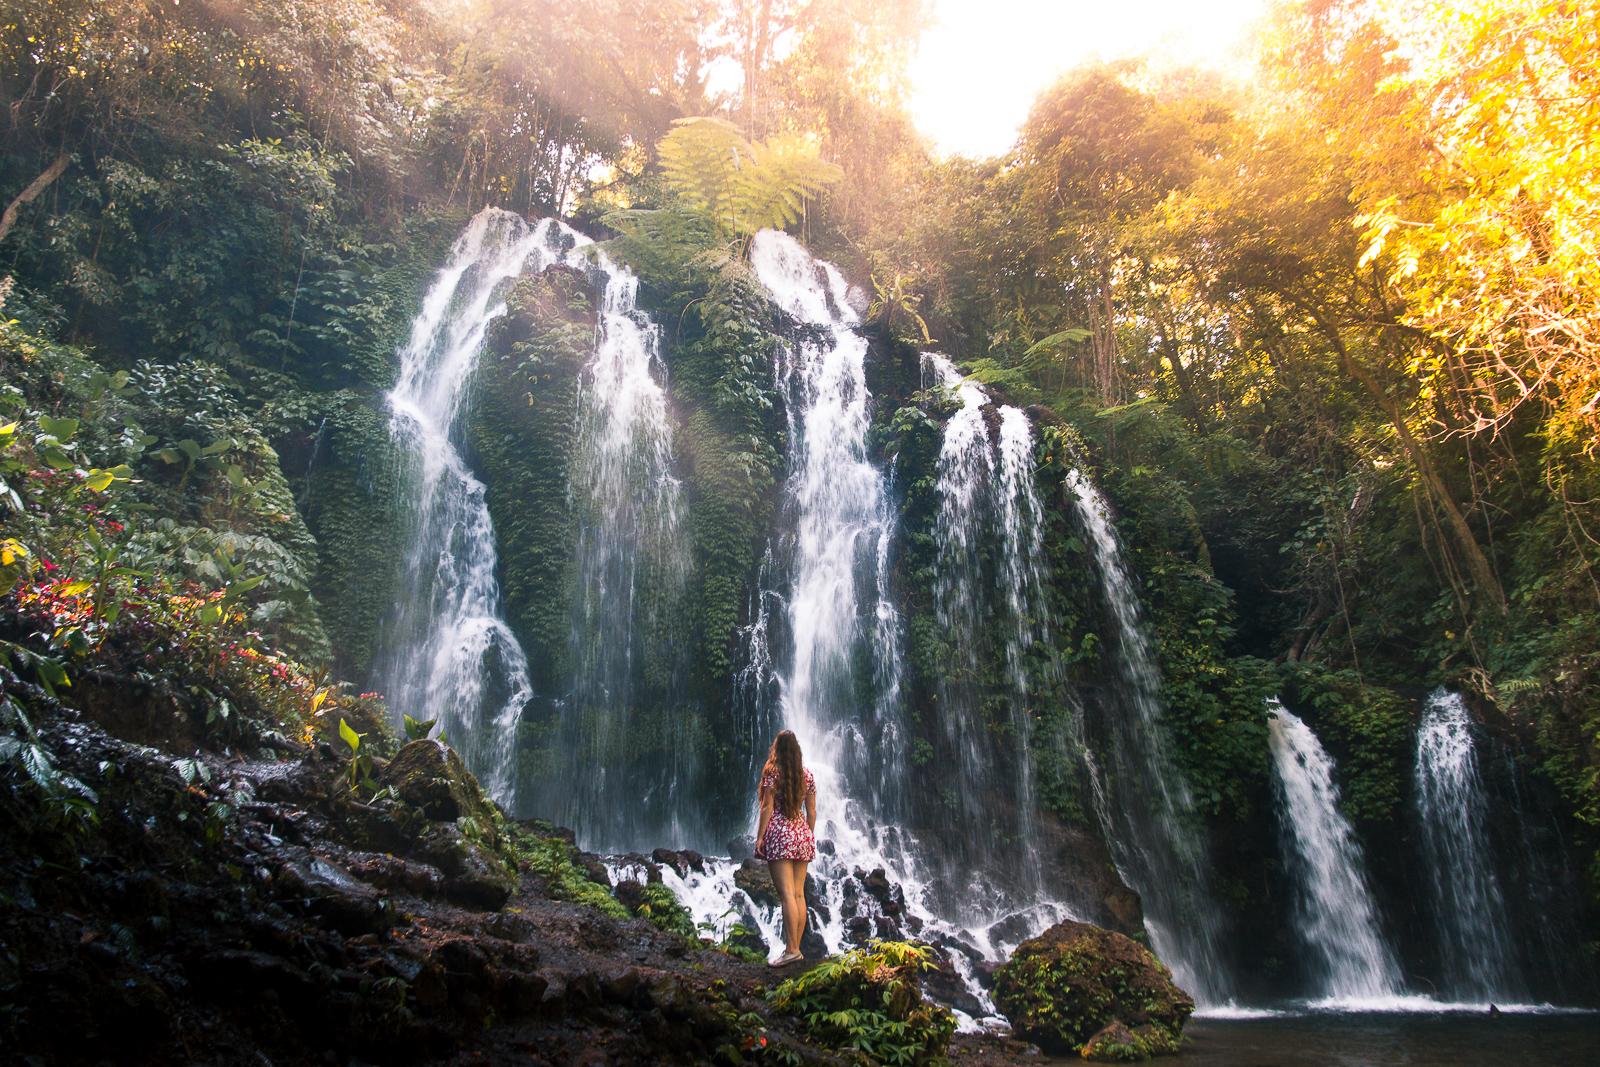 The Banyu Wana Amertha Waterfall Bali S Best Kept Secret